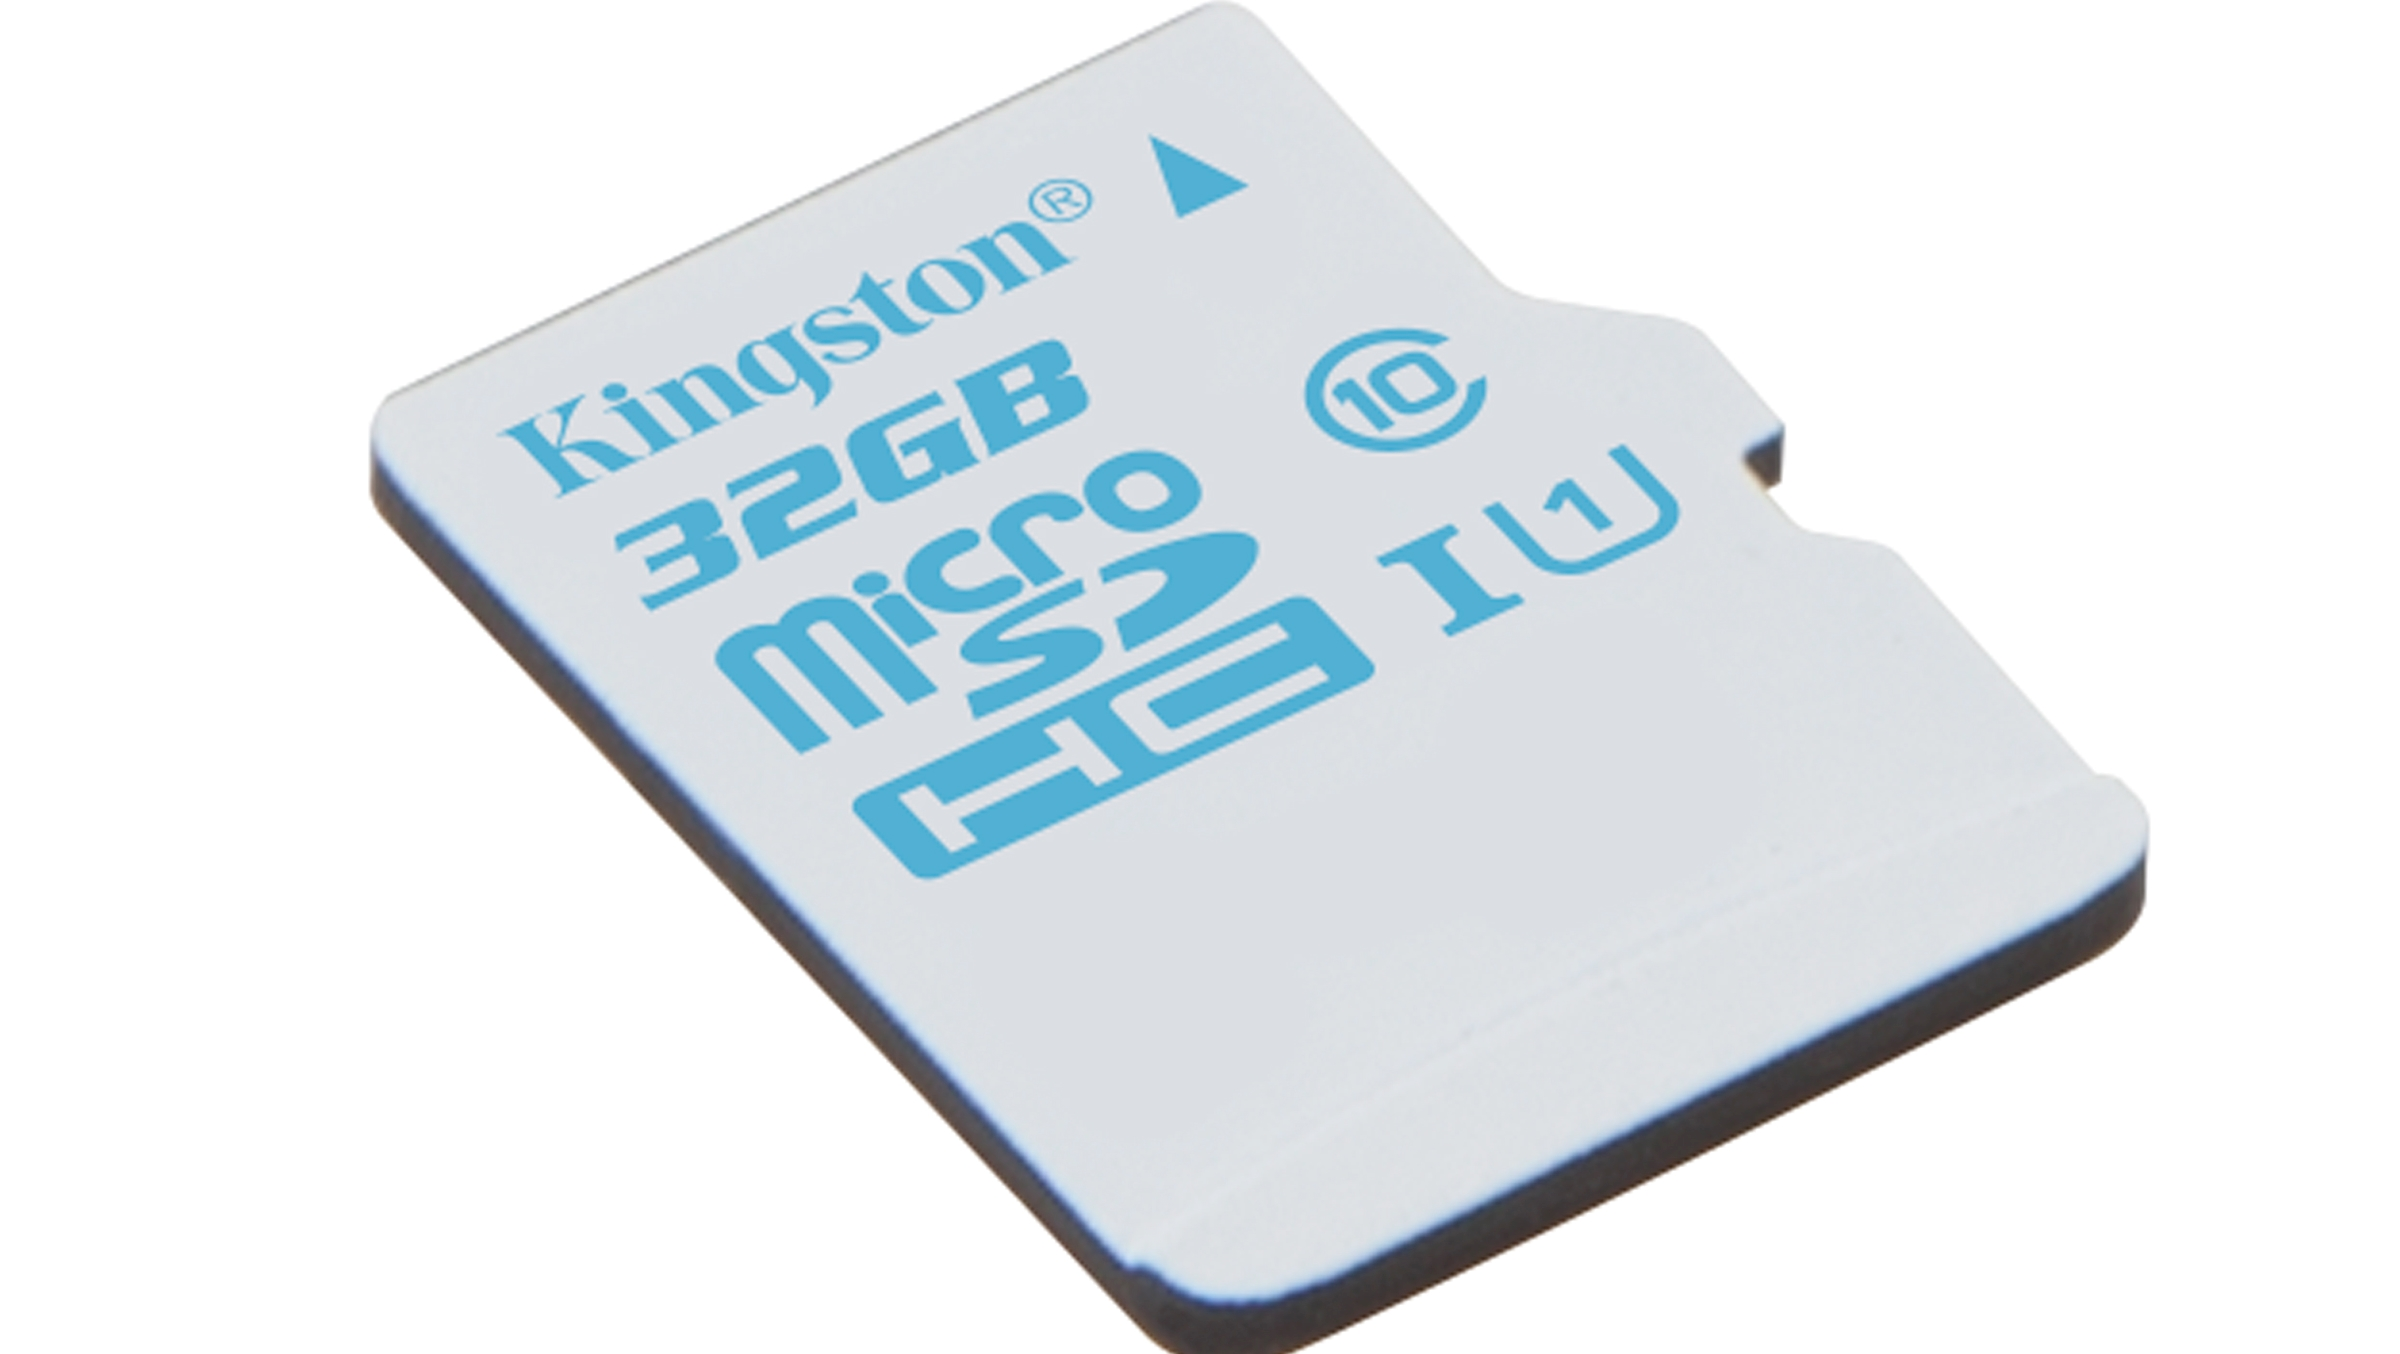 Kingston microSD Action Camera